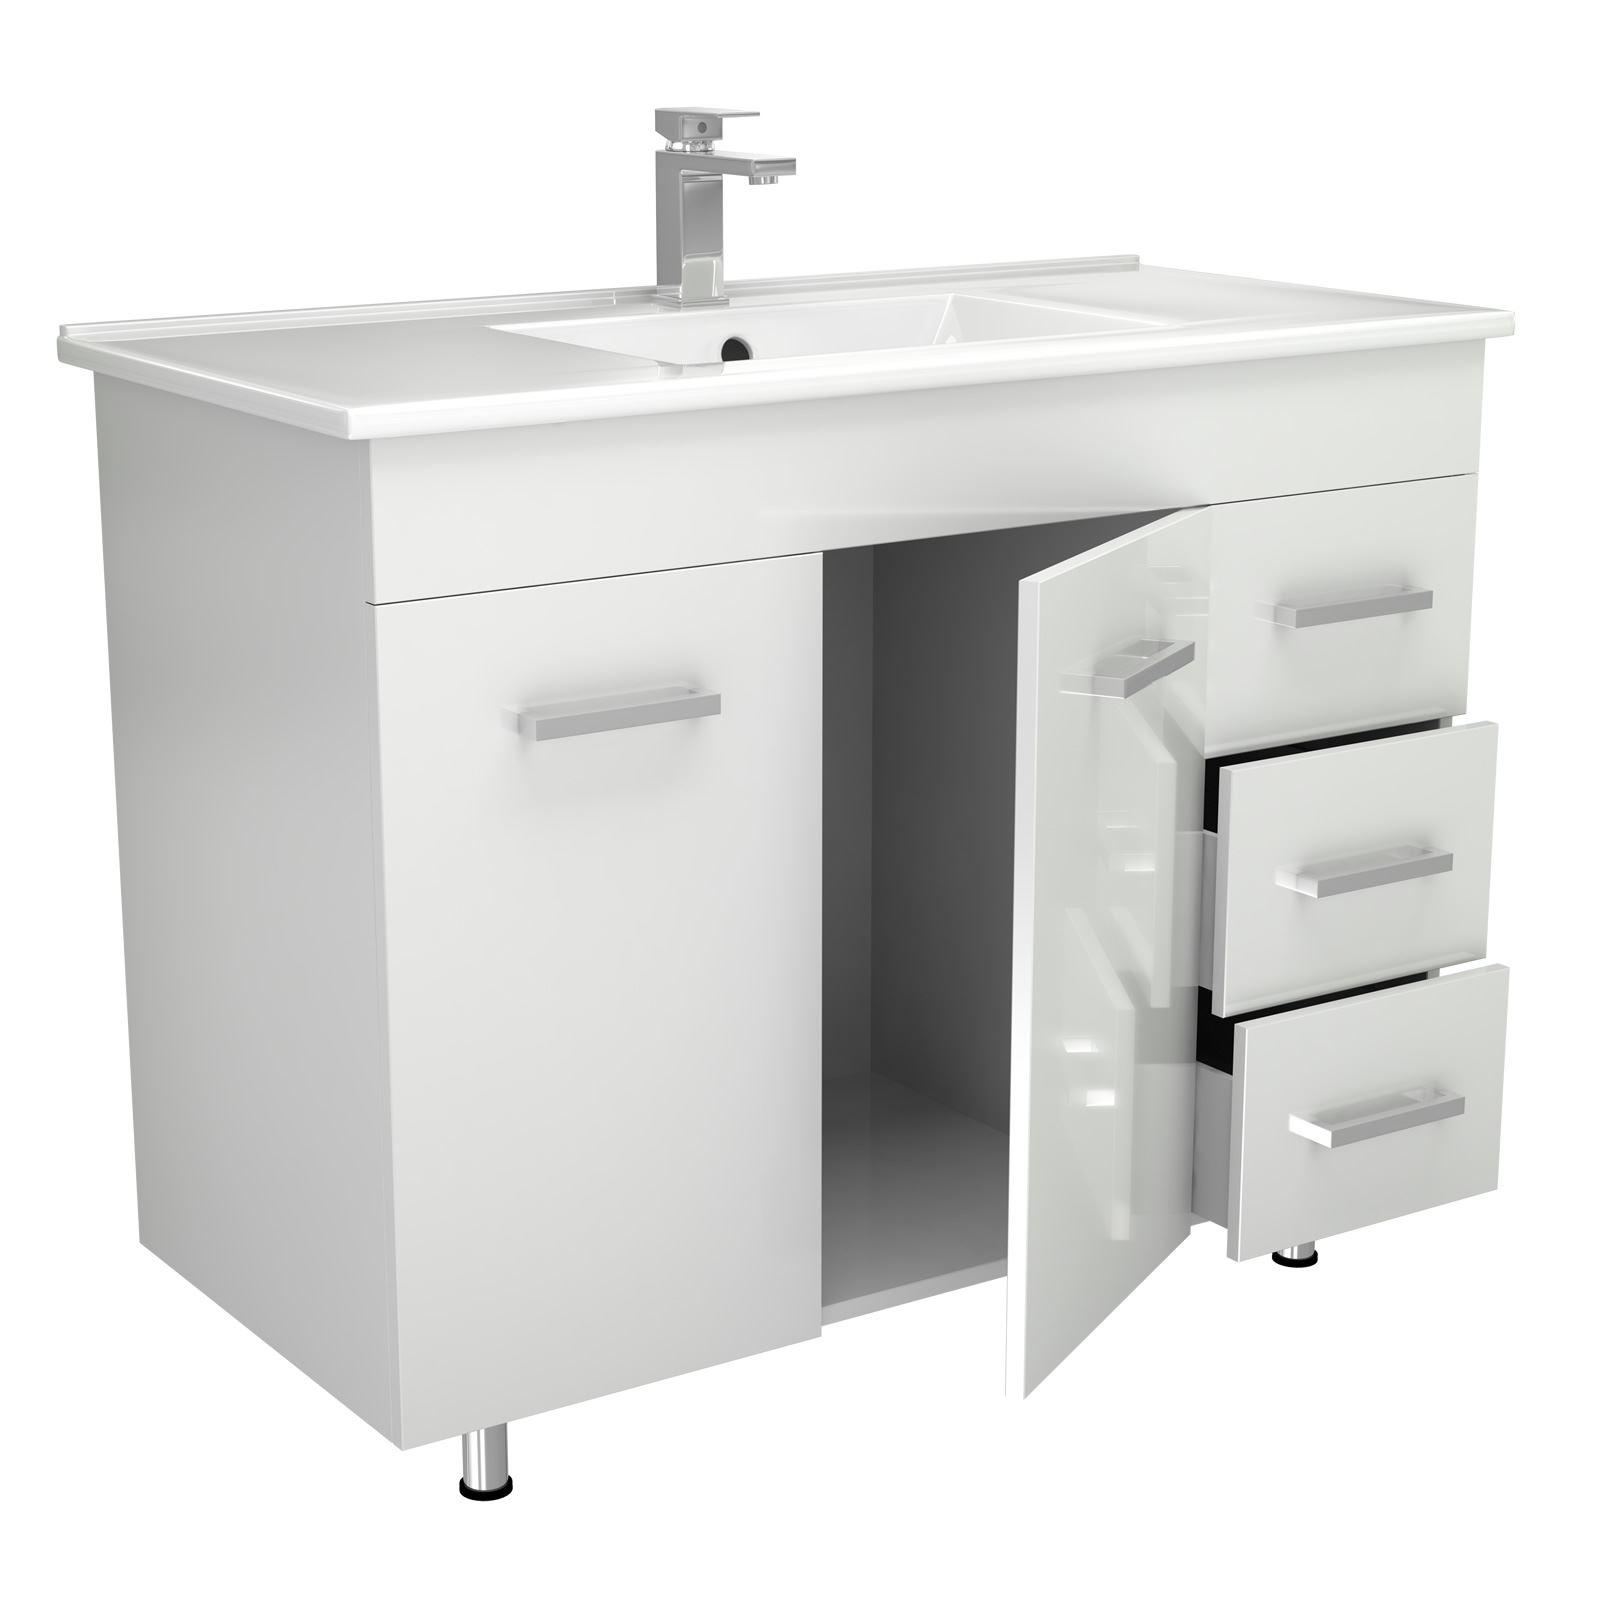 Modern high gloss white bathroom furniture vanity storage - White gloss bathroom vanity unit ...